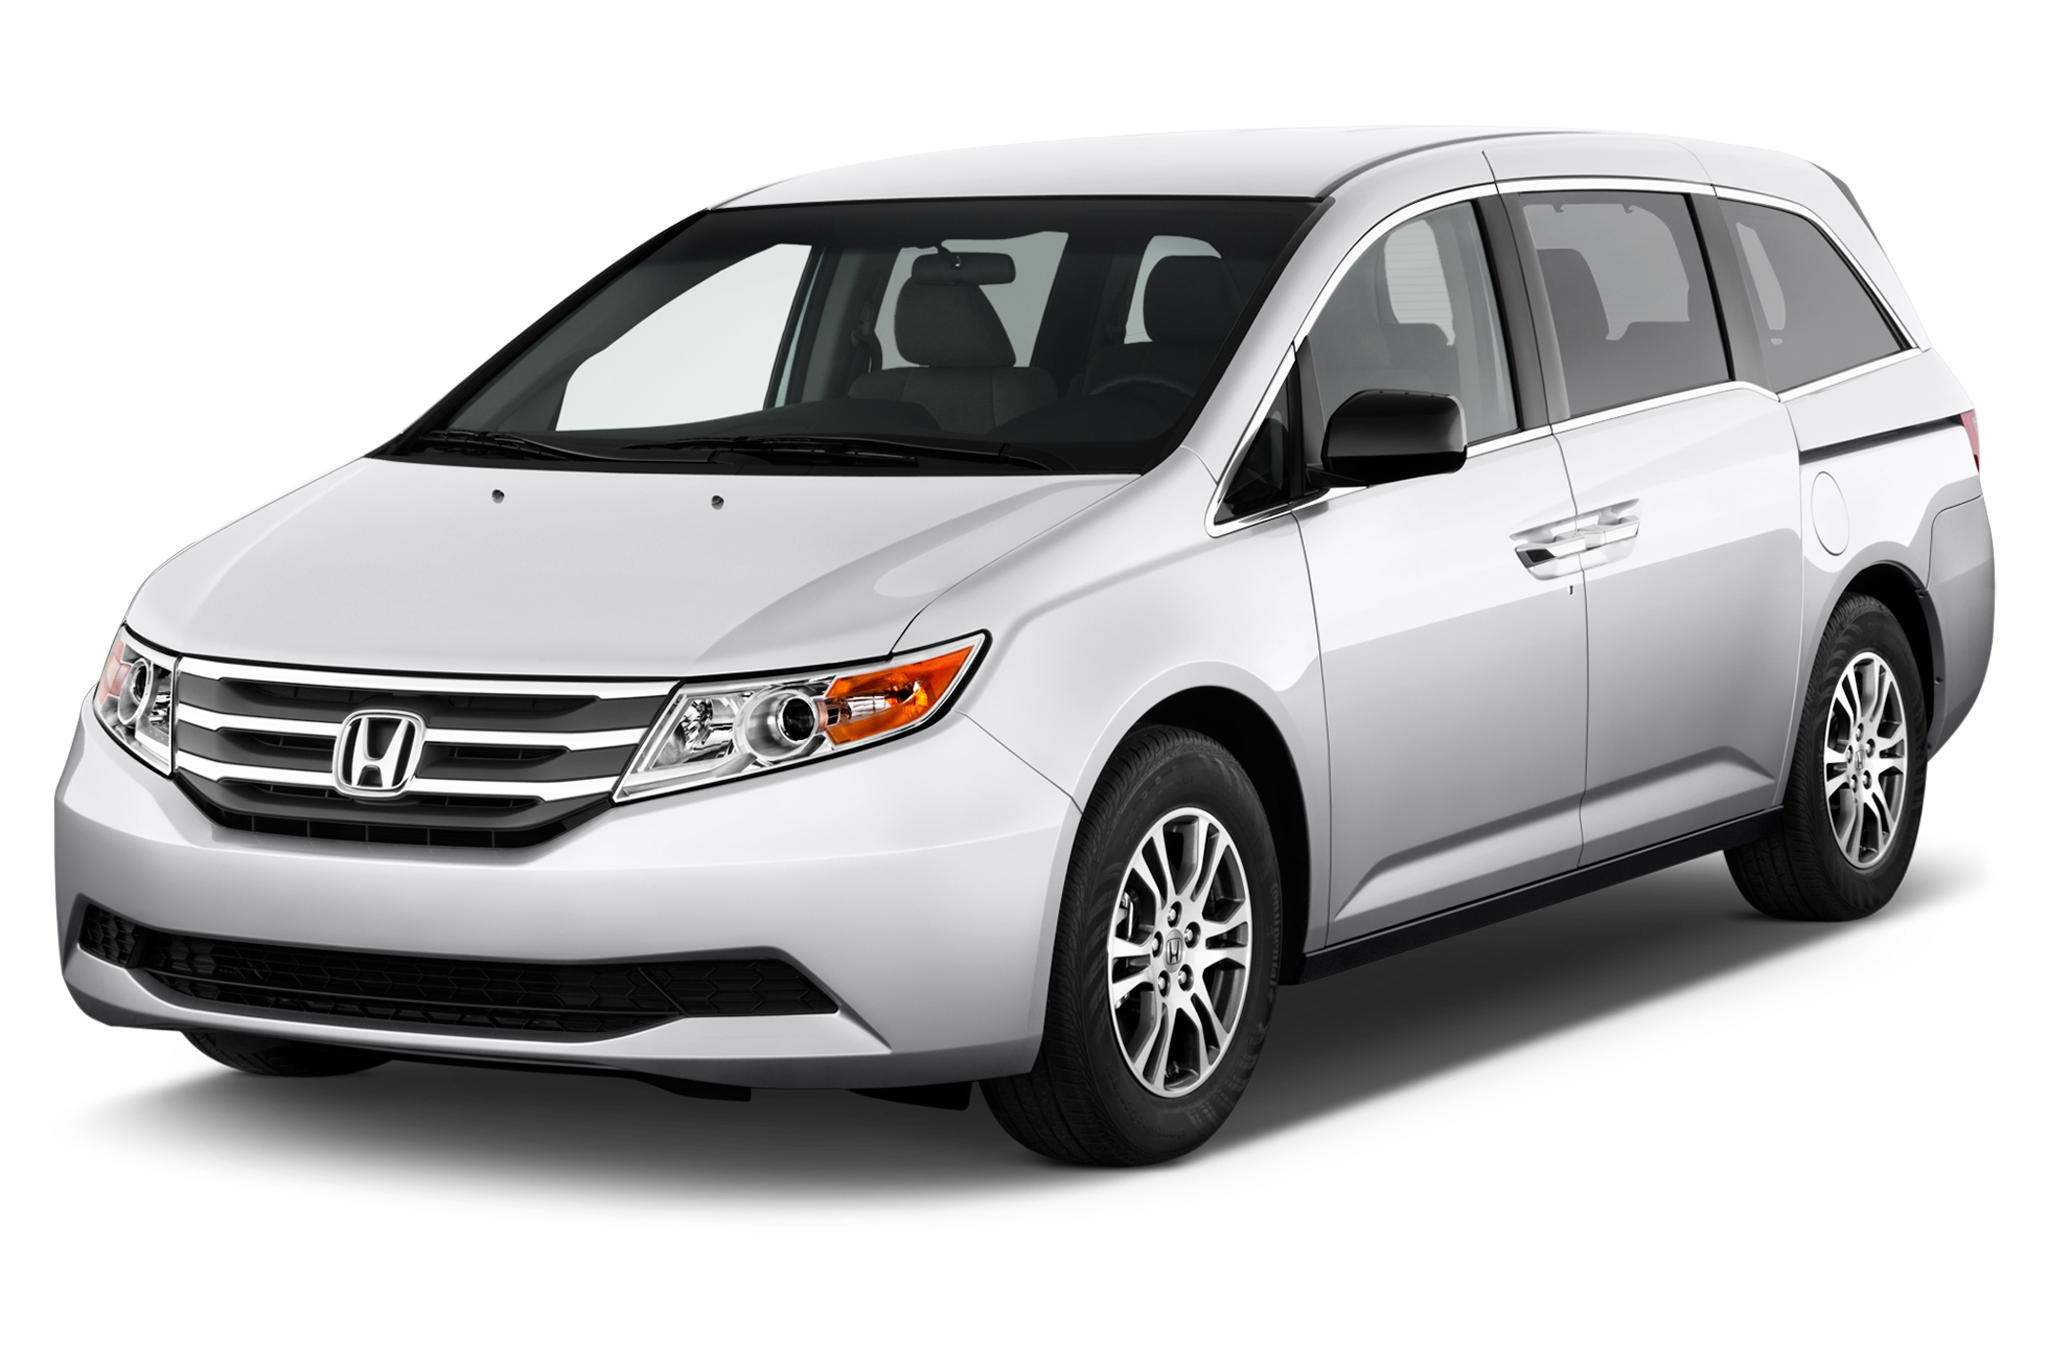 Honda Odyssey IV 2008 - 2013 Compact MPV #2